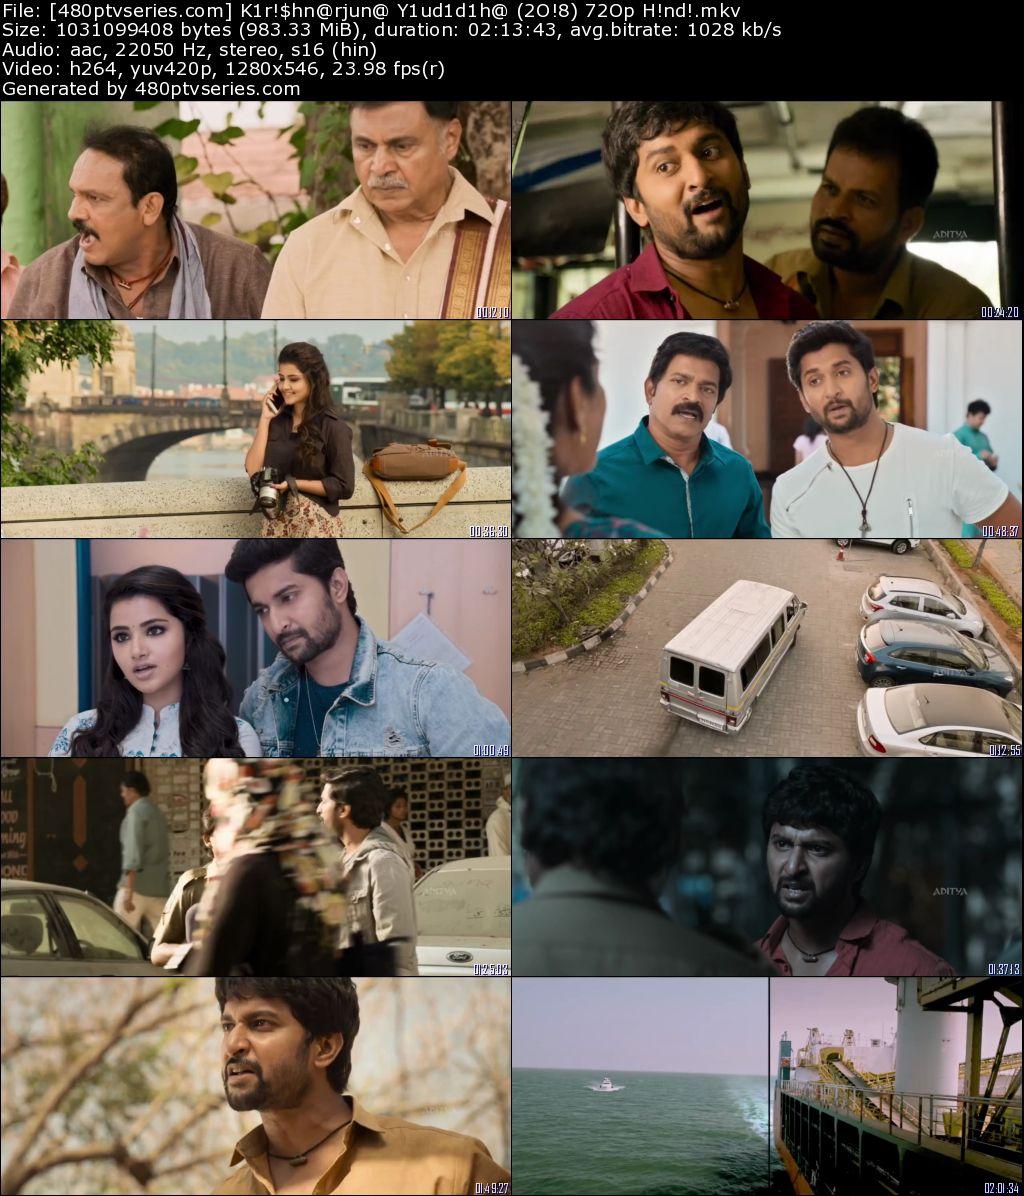 Download Krishnarjuna Yuddham (2018) 950Mb Full Hindi Dubbed Movie Download 720p HDRip Free Watch Online Full Movie Download Worldfree4u 9xmovies